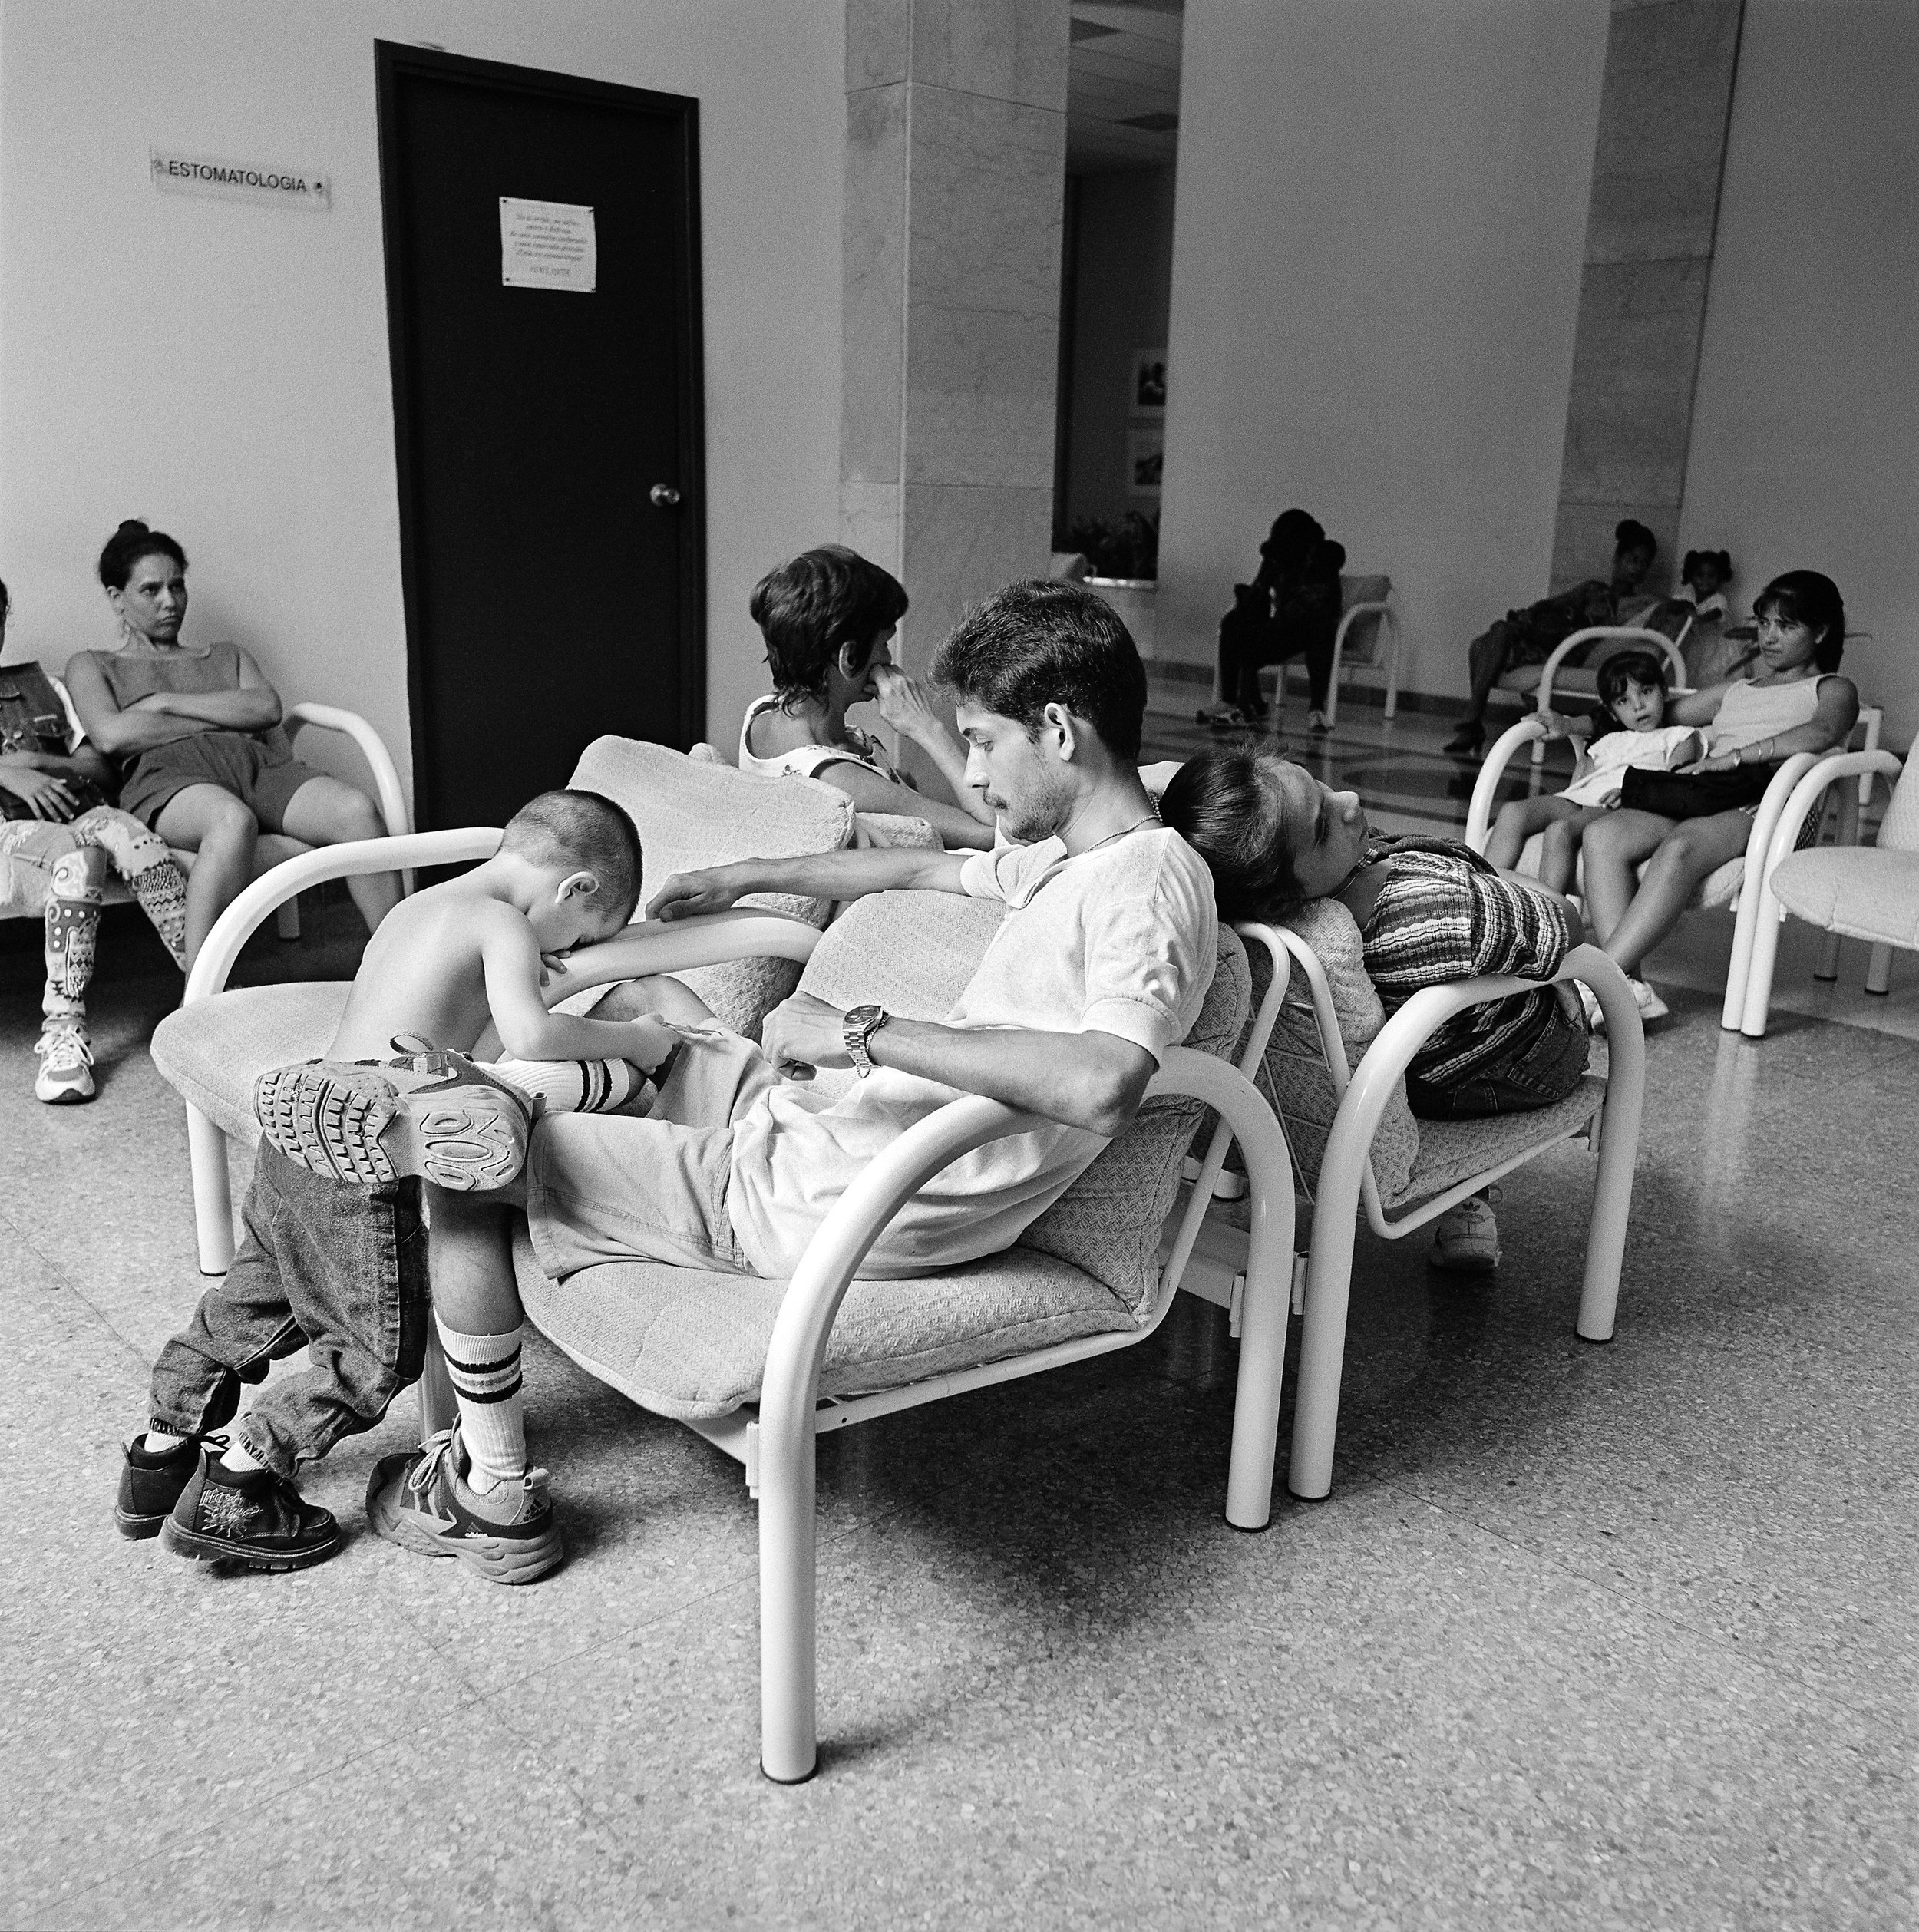 Cuba-waiting-room-adj.jpg